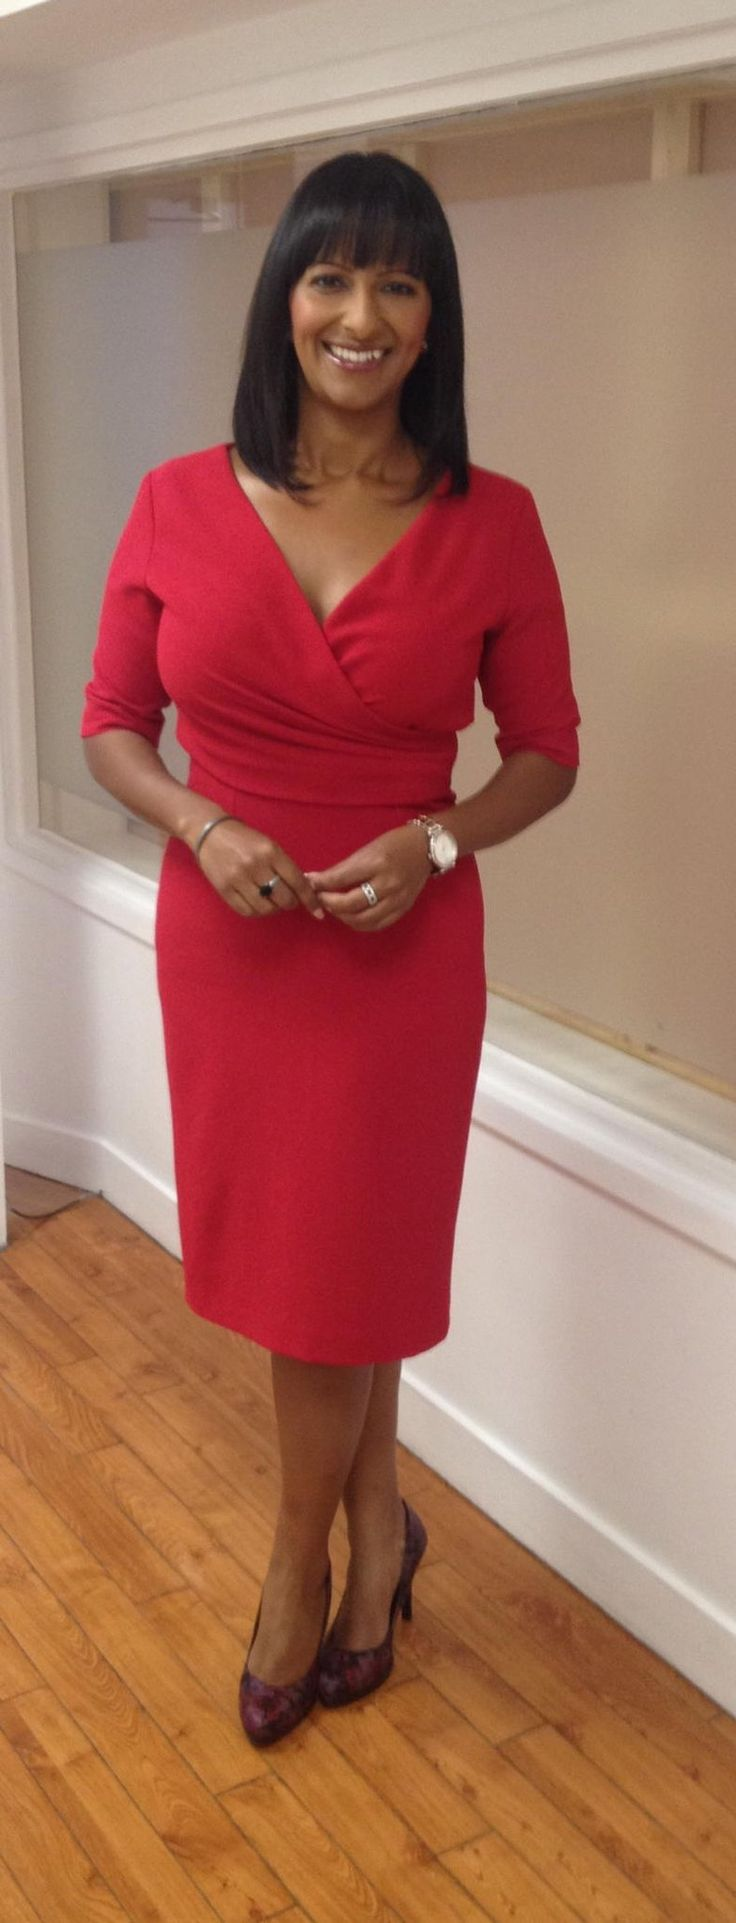 .@GMB @ranvir01 wearing @FeeGClothing dress @MarksAnSpencer shoes! #styledbydeb